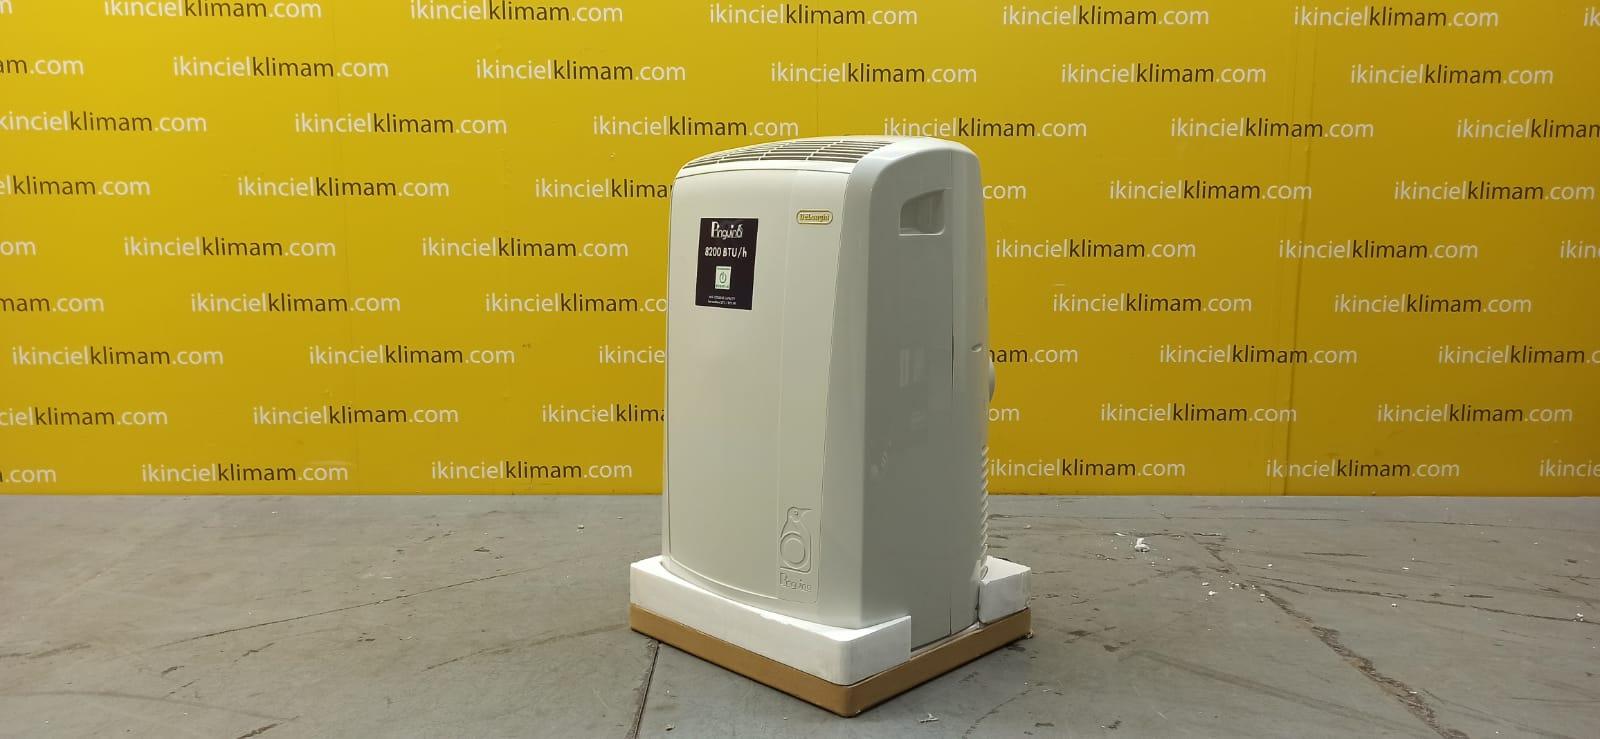 DELONGI PAC N76 Pinguino ( Sadece Soğutma ) A Enerji Sınıfı 8200 BTU On-Off  Mobil Portatif Klima